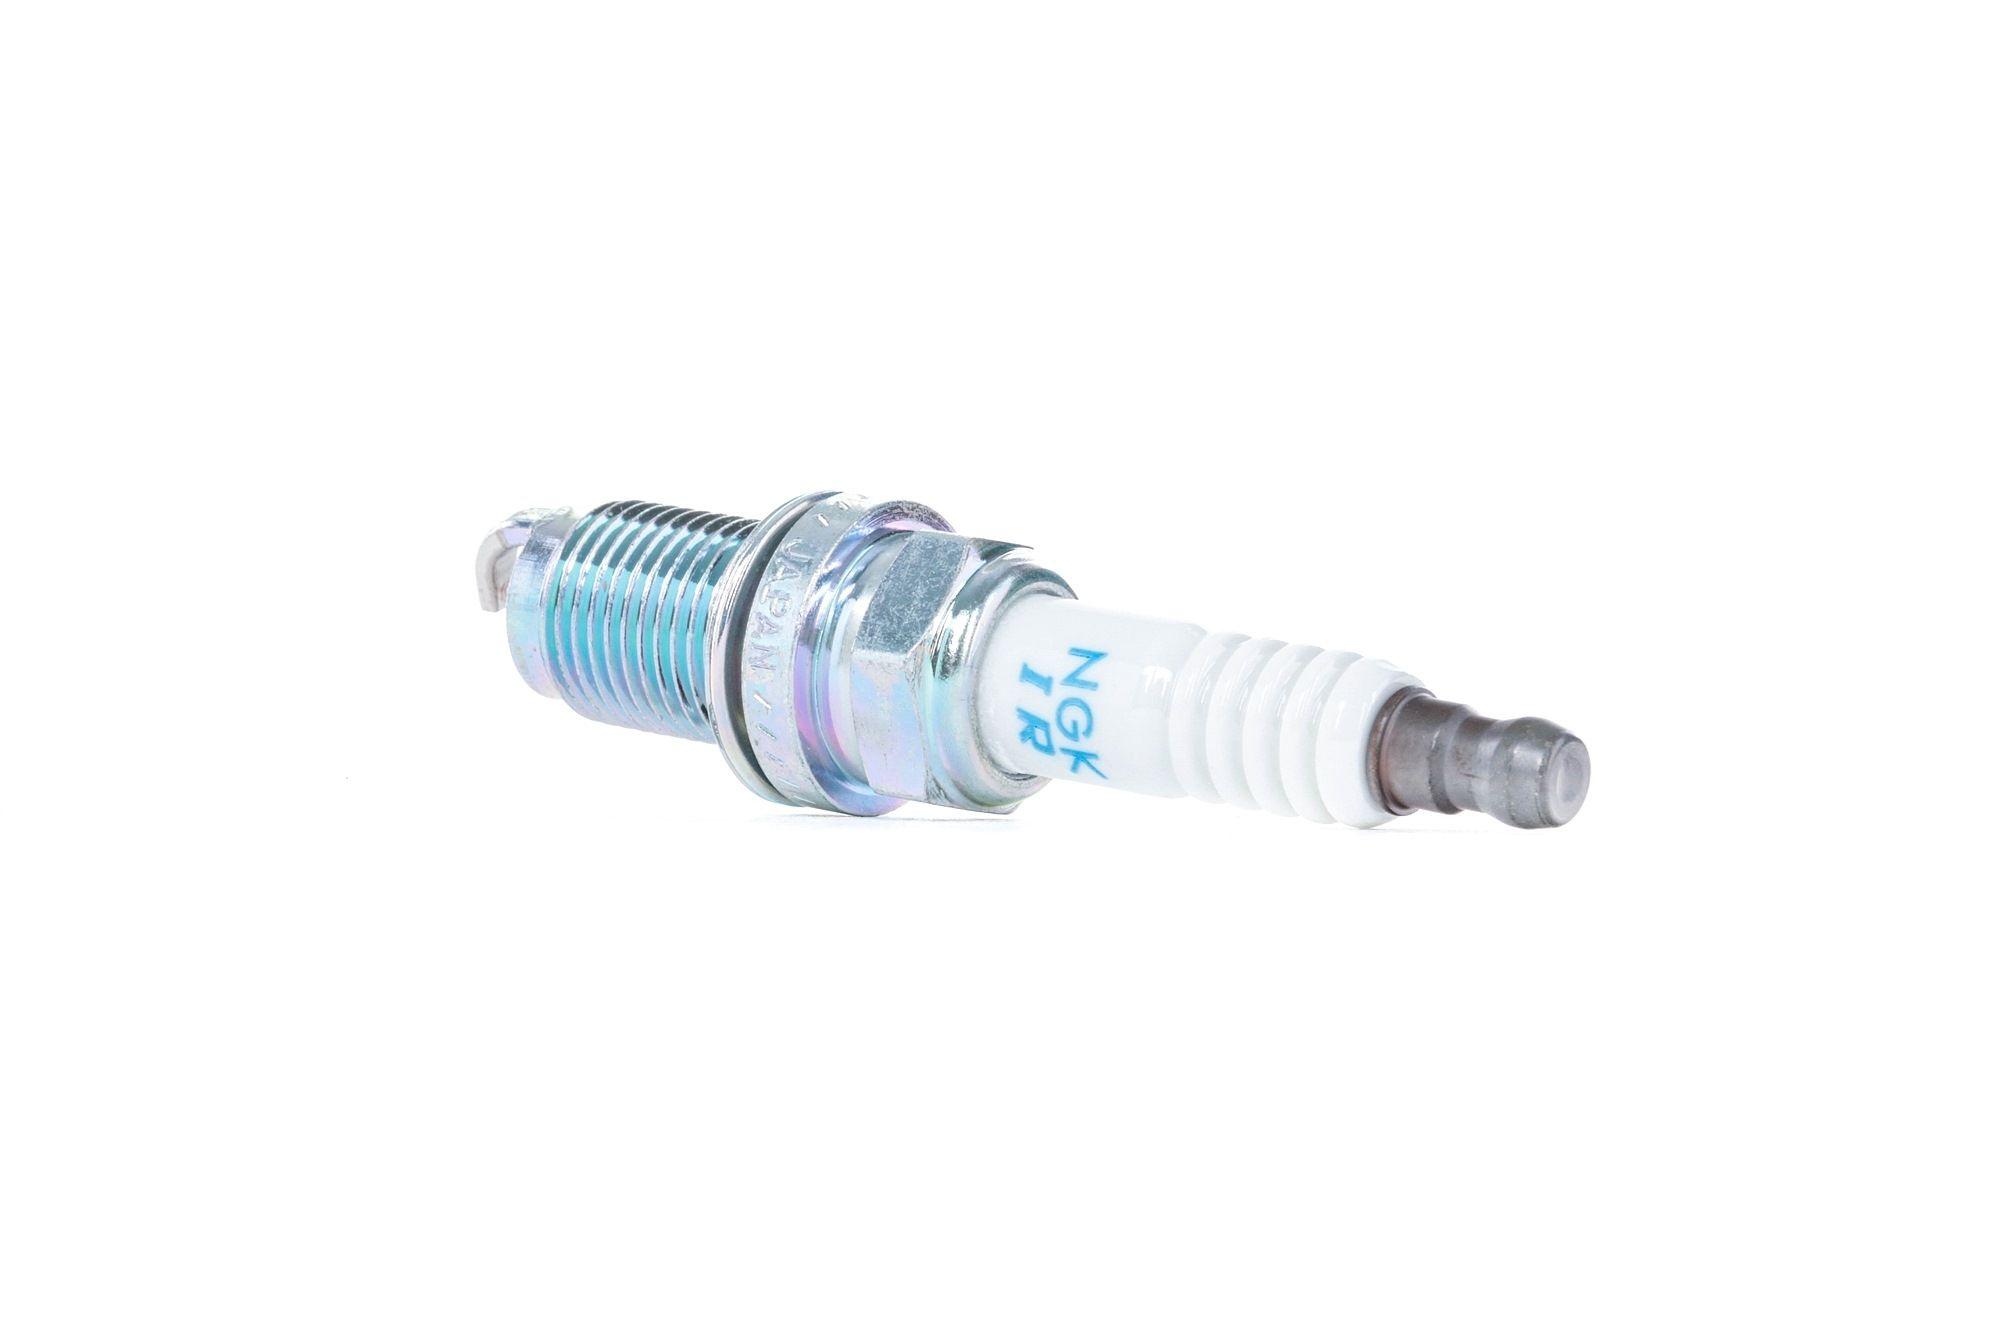 Spark Plug NGK 6994 rating